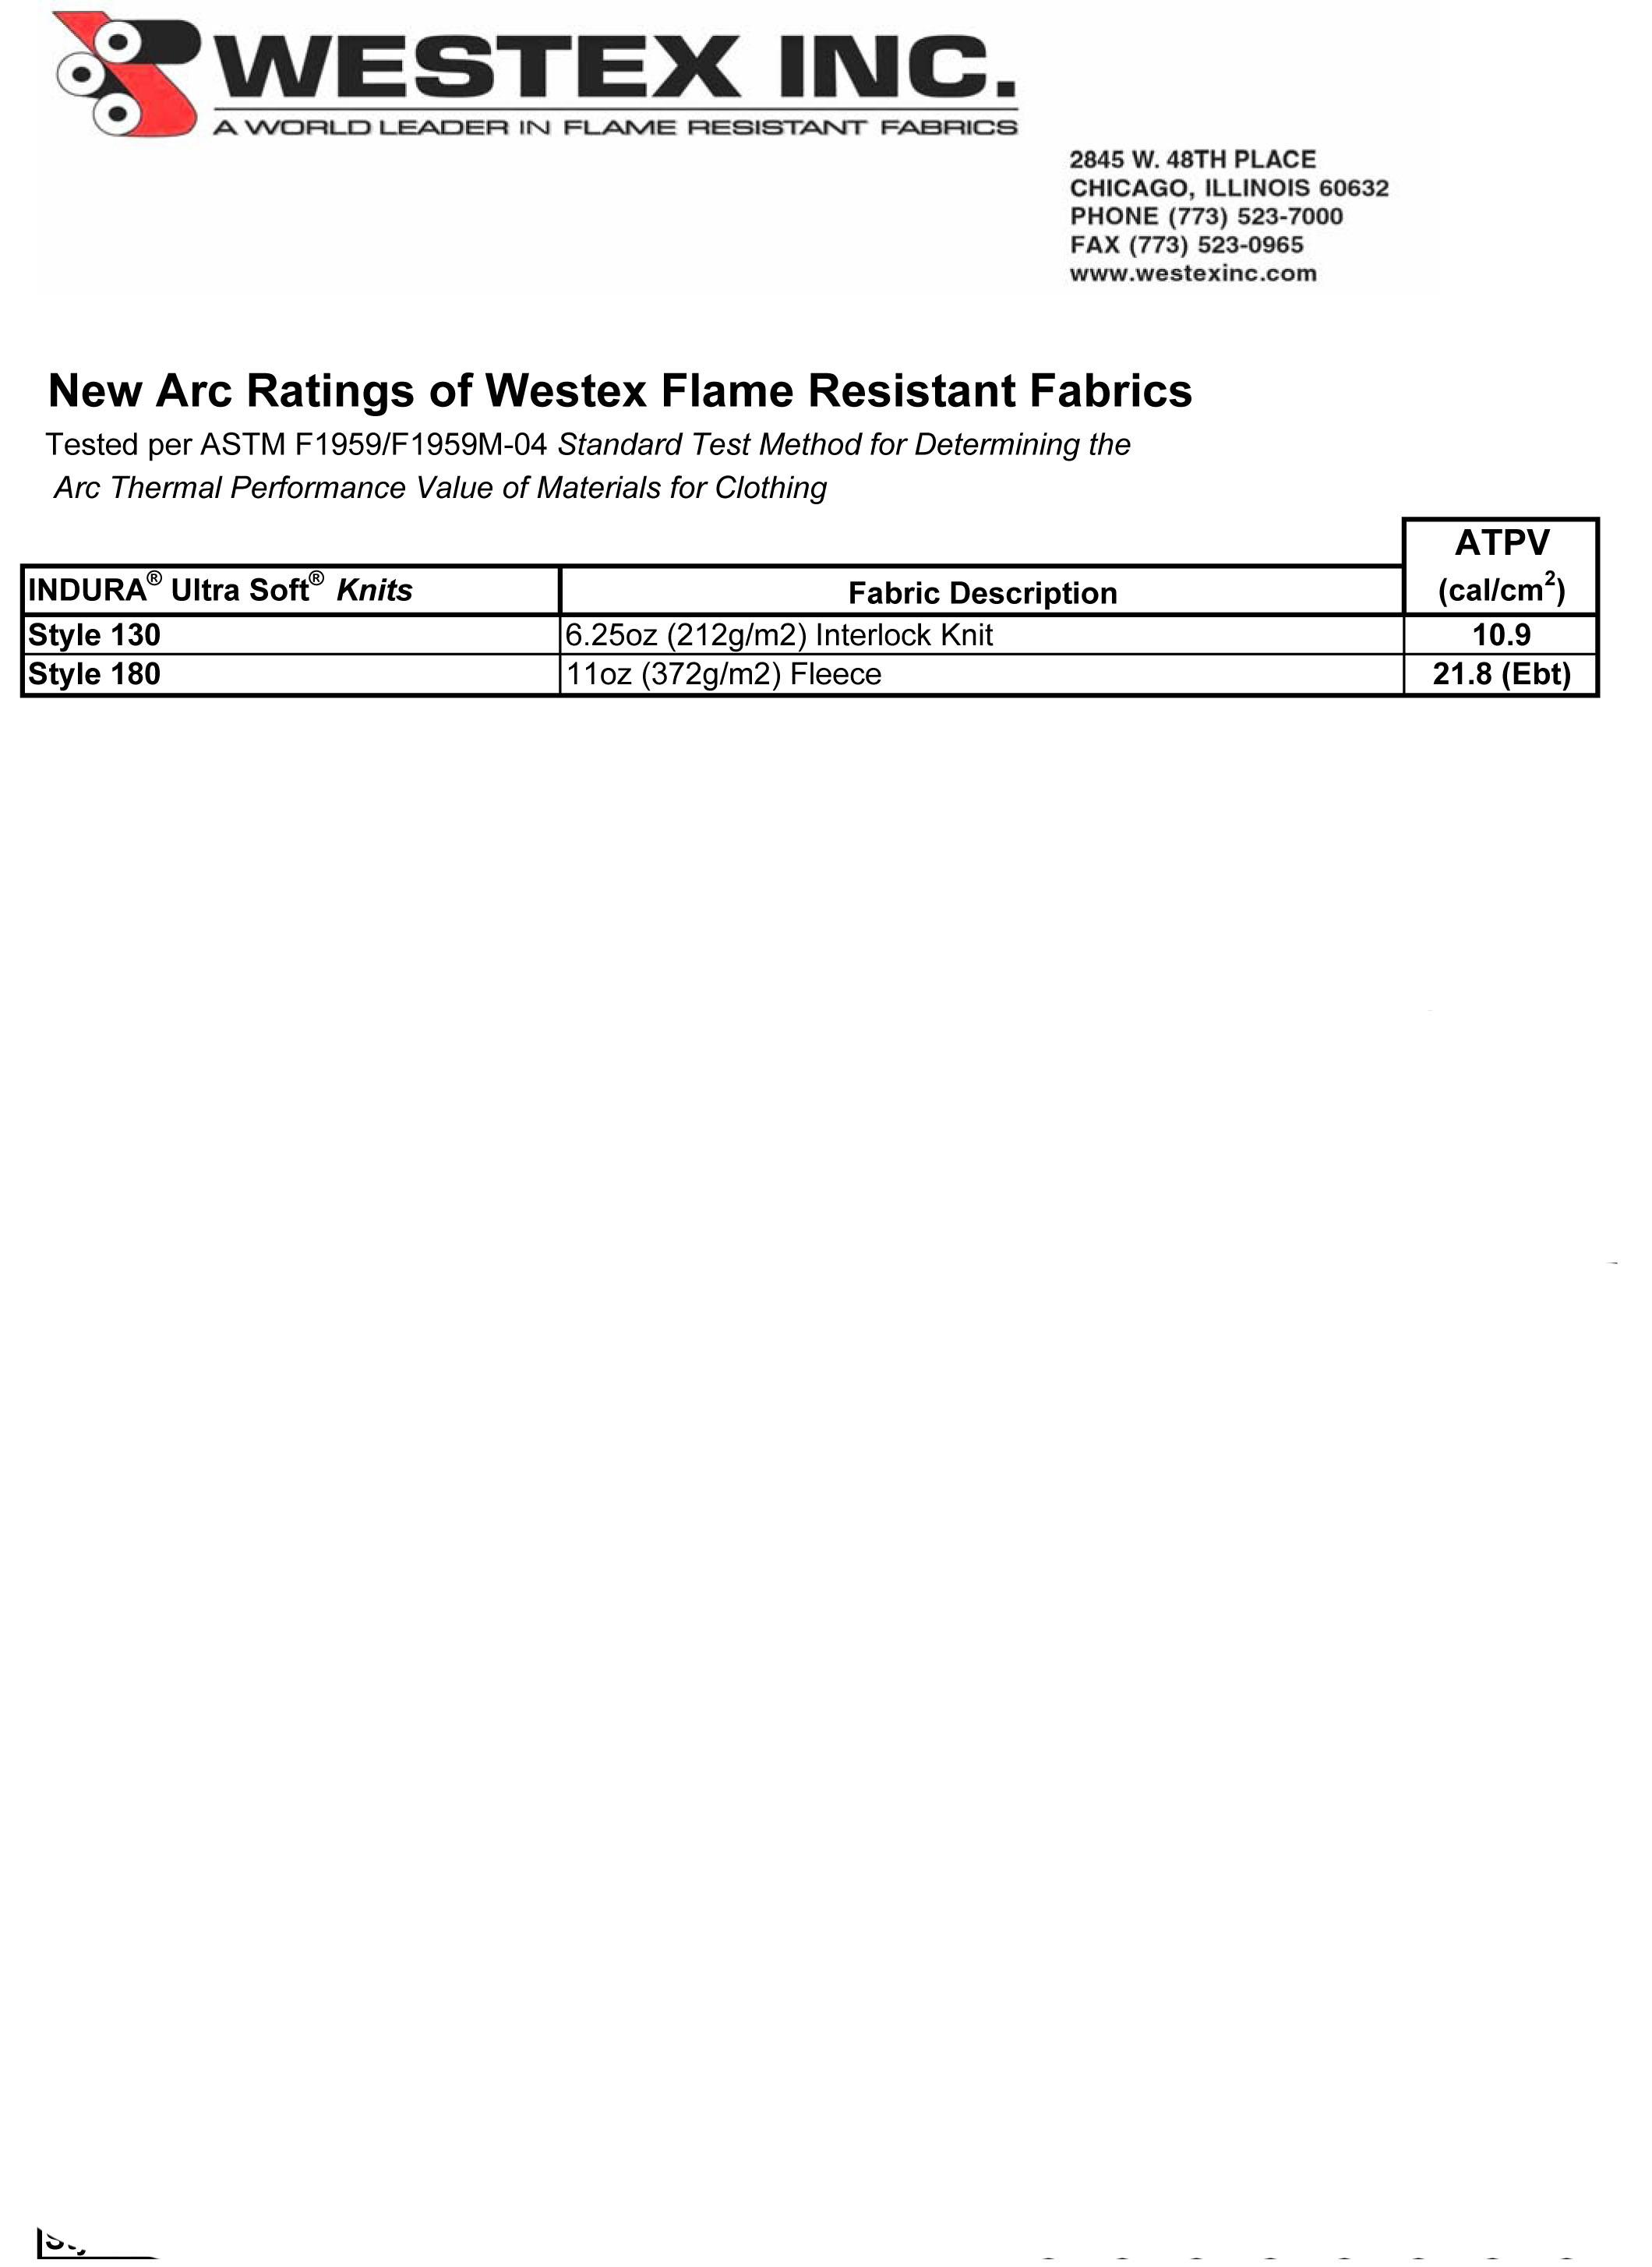 westex-arc-ratings-knits-1-.jpg